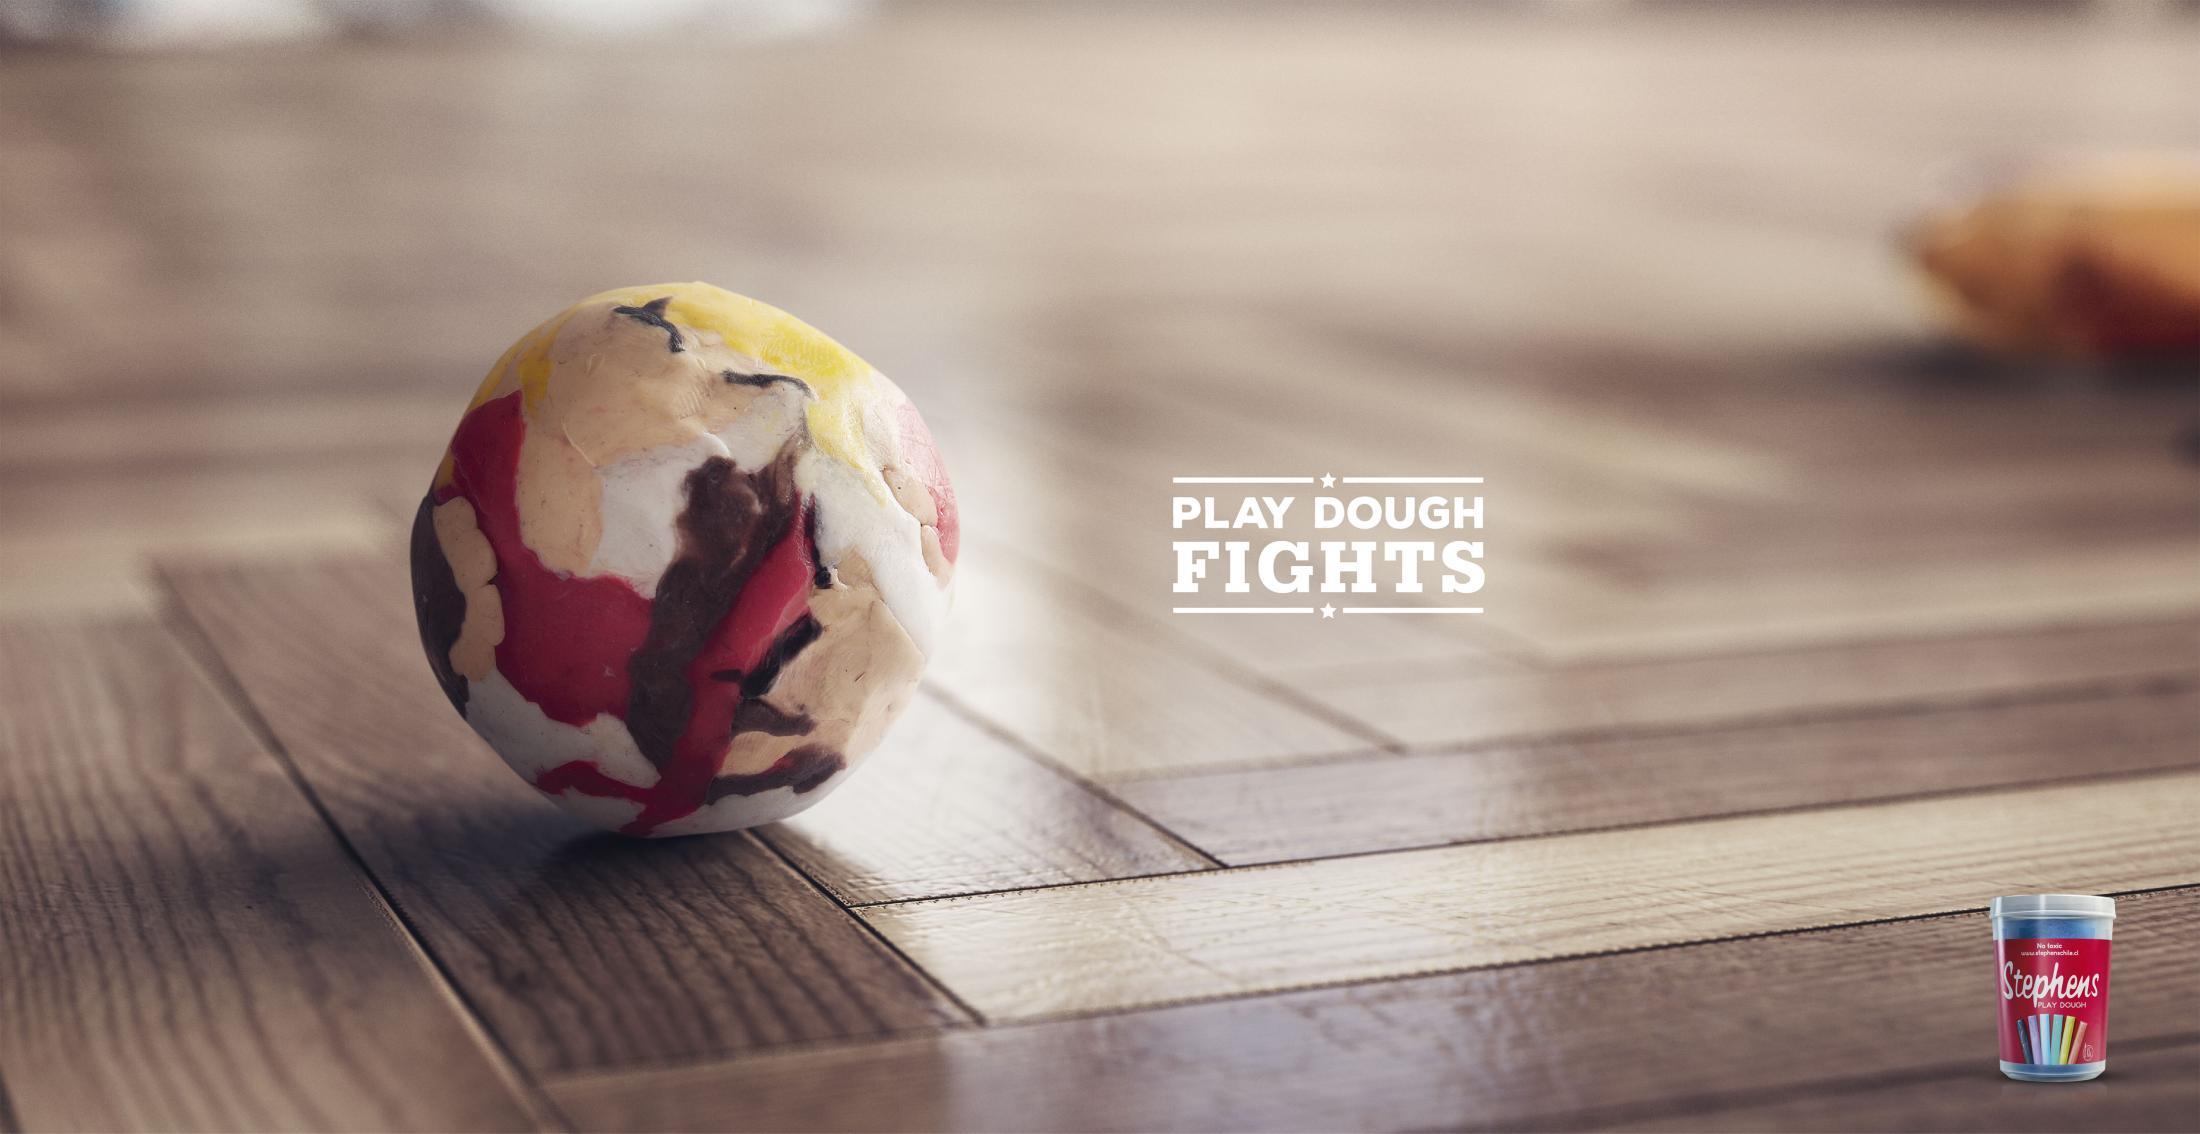 Stephens Print Ad - Play Dough Fights, 1